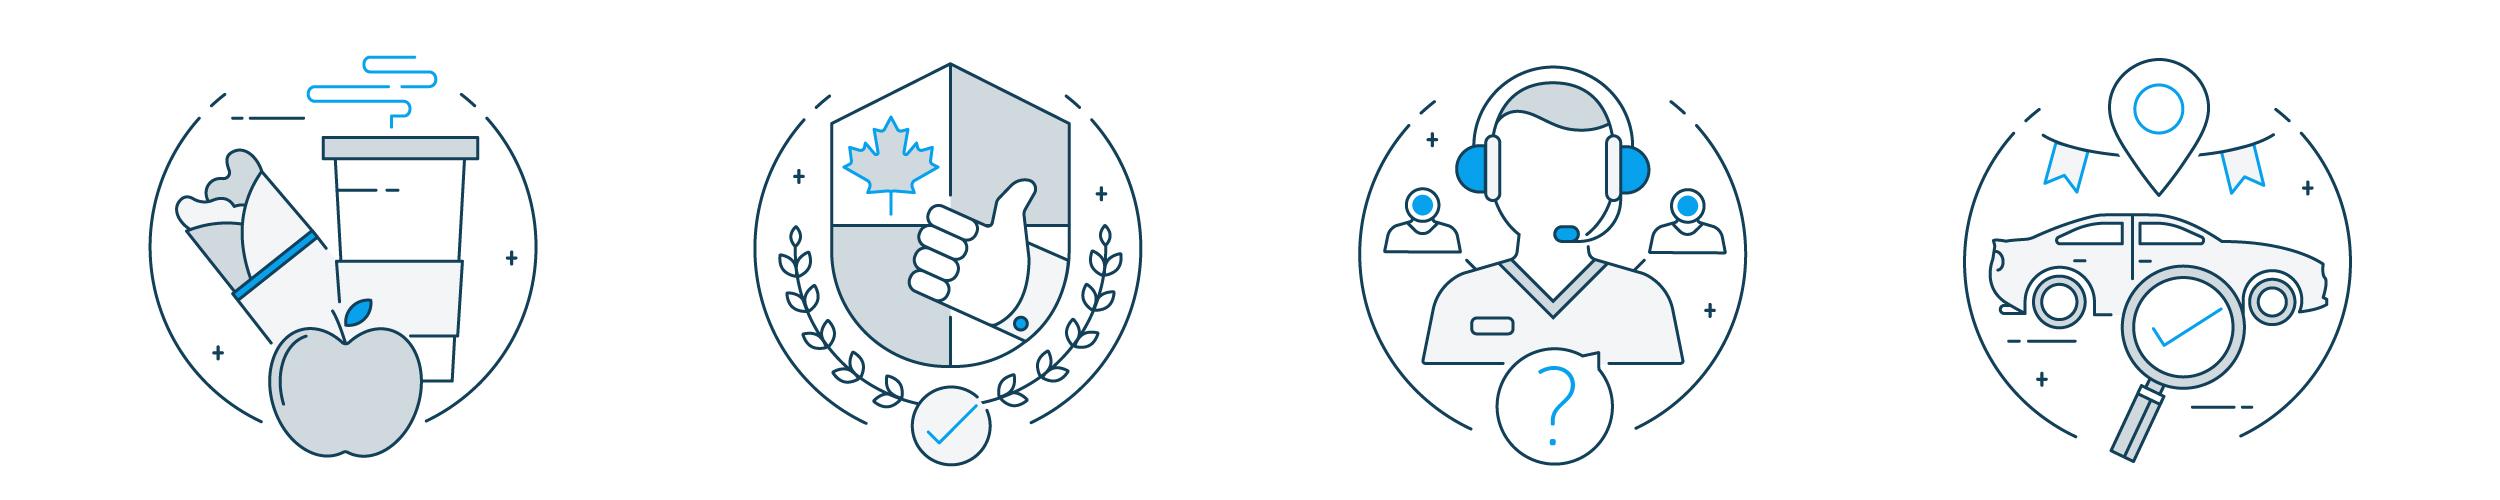 canadadrives-icon-3.jpg